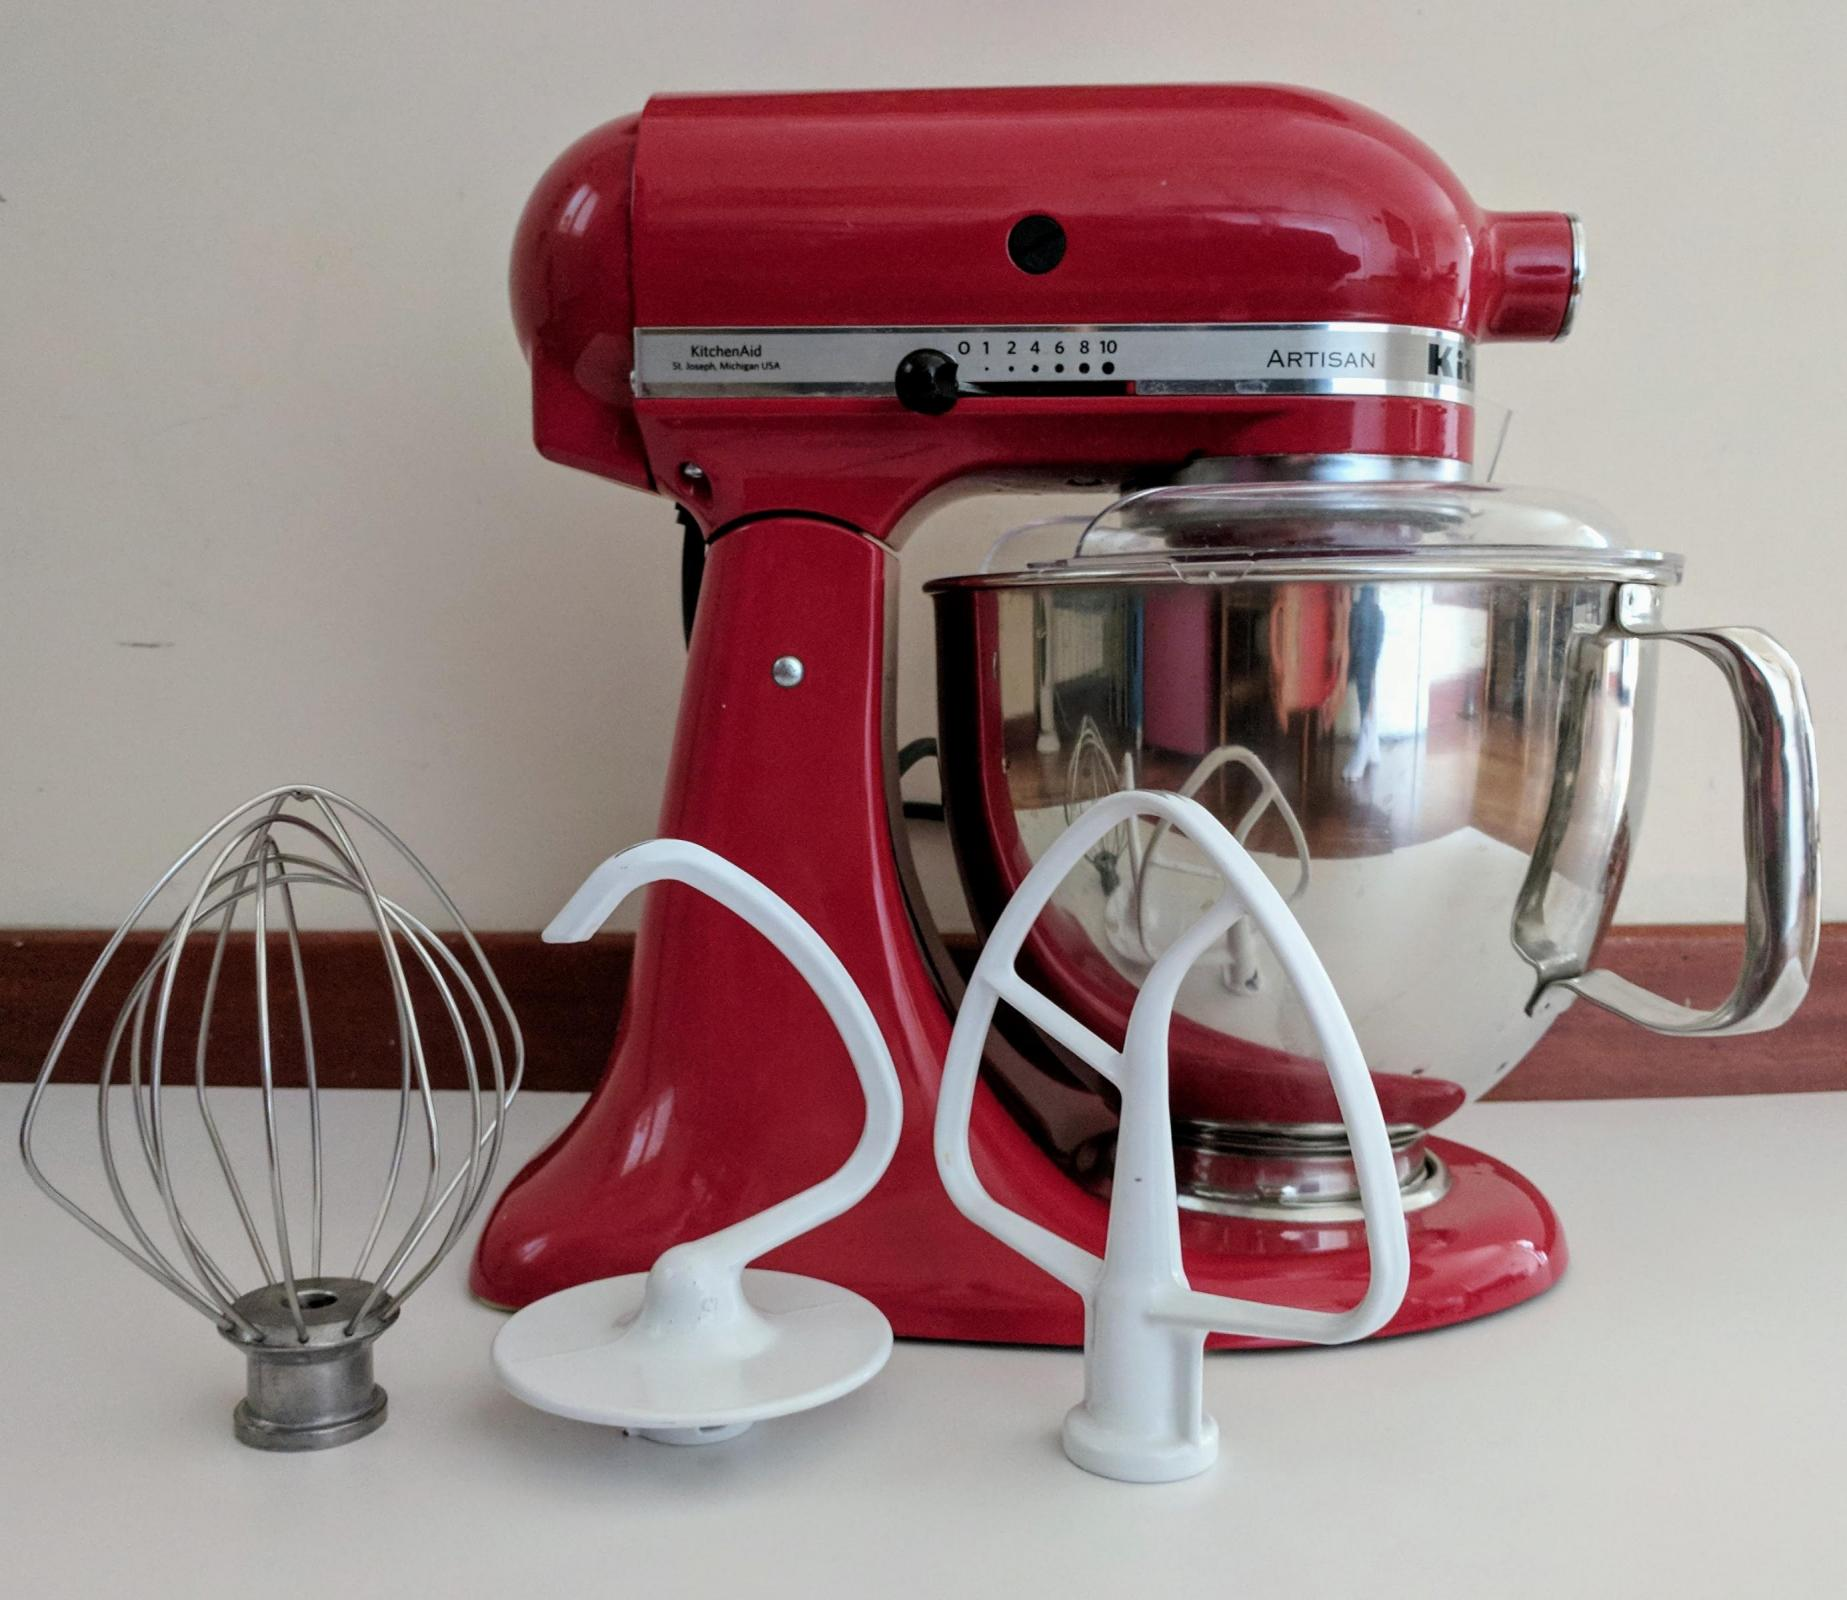 Kitchenaid Artisan stand mixer 4 8L empire red